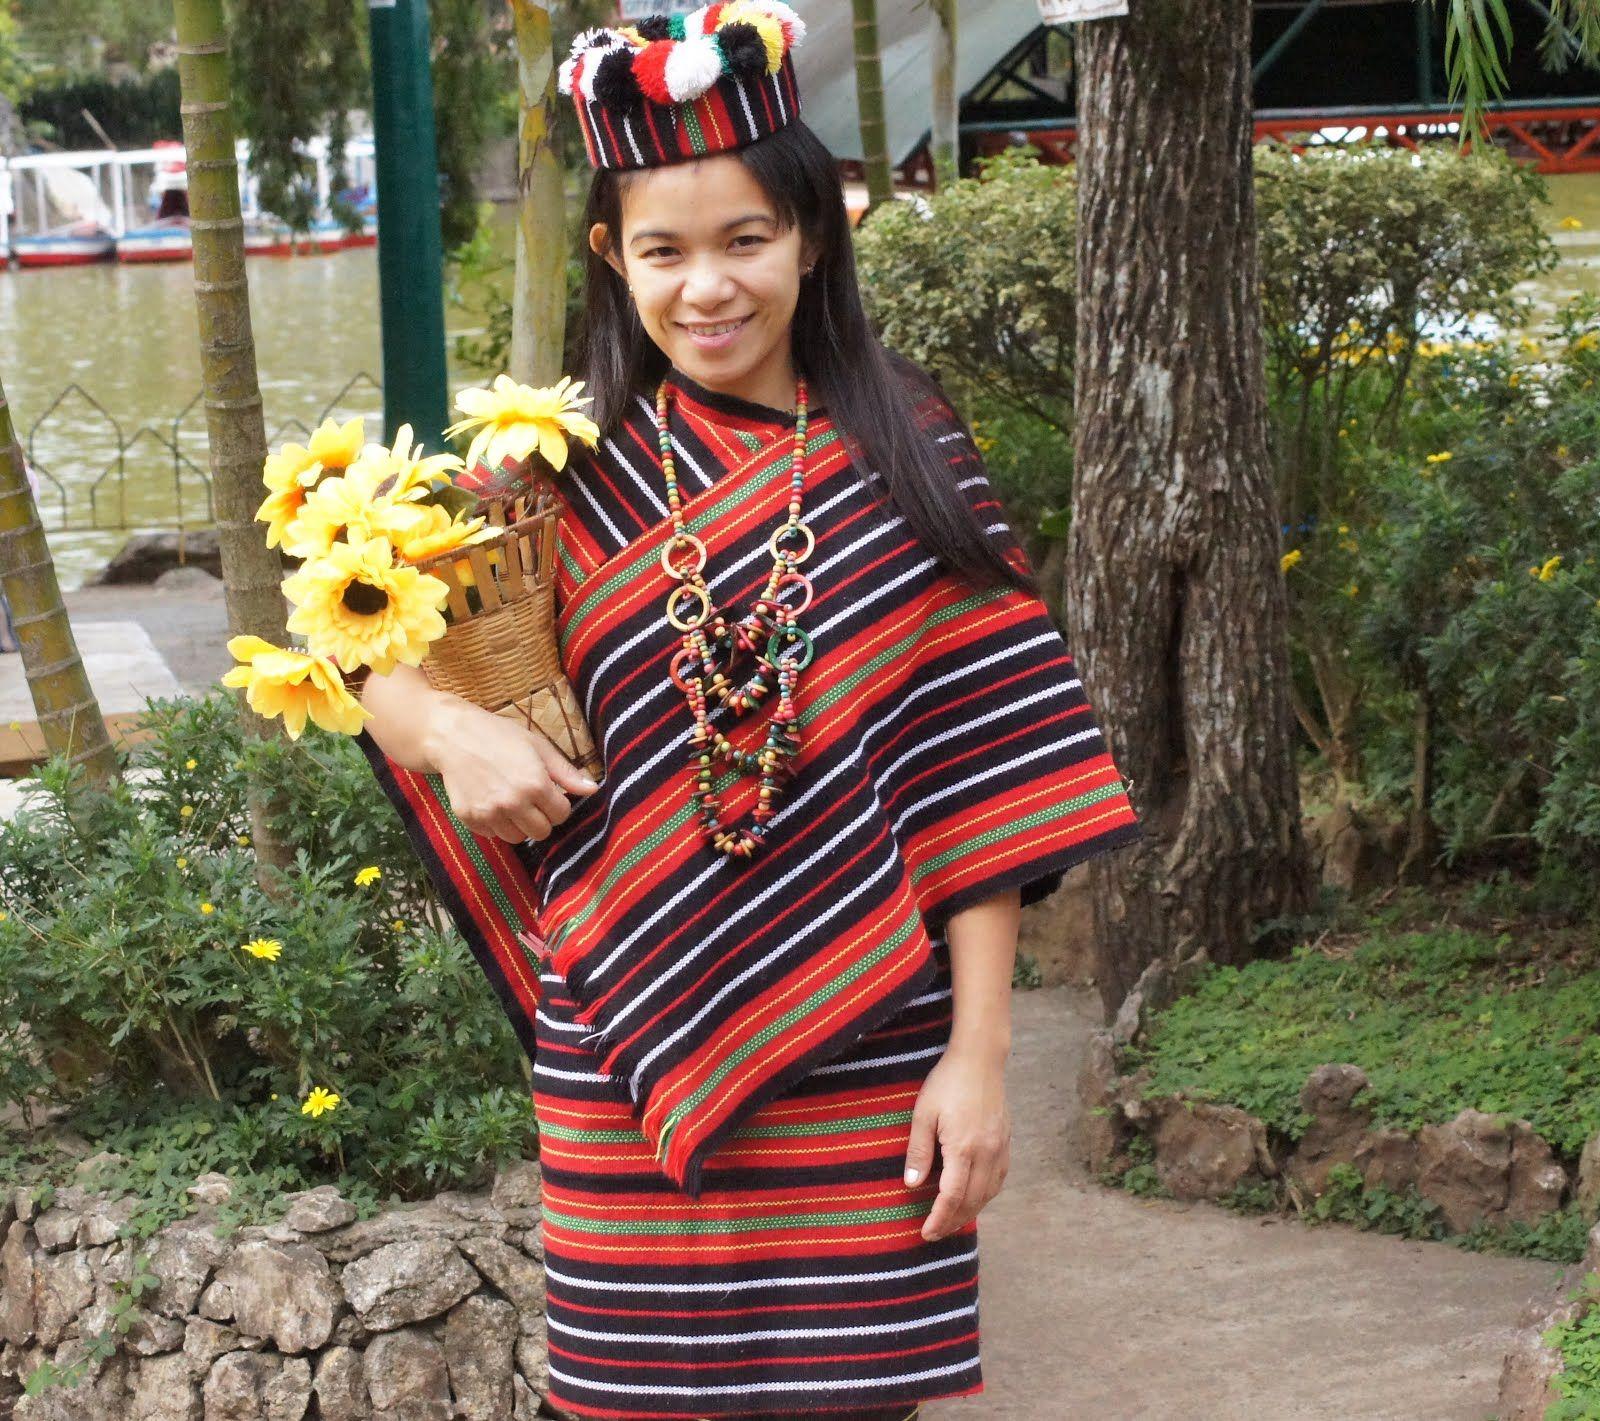 Igorot Woman in Her Native Costume Z Filipiniana dress